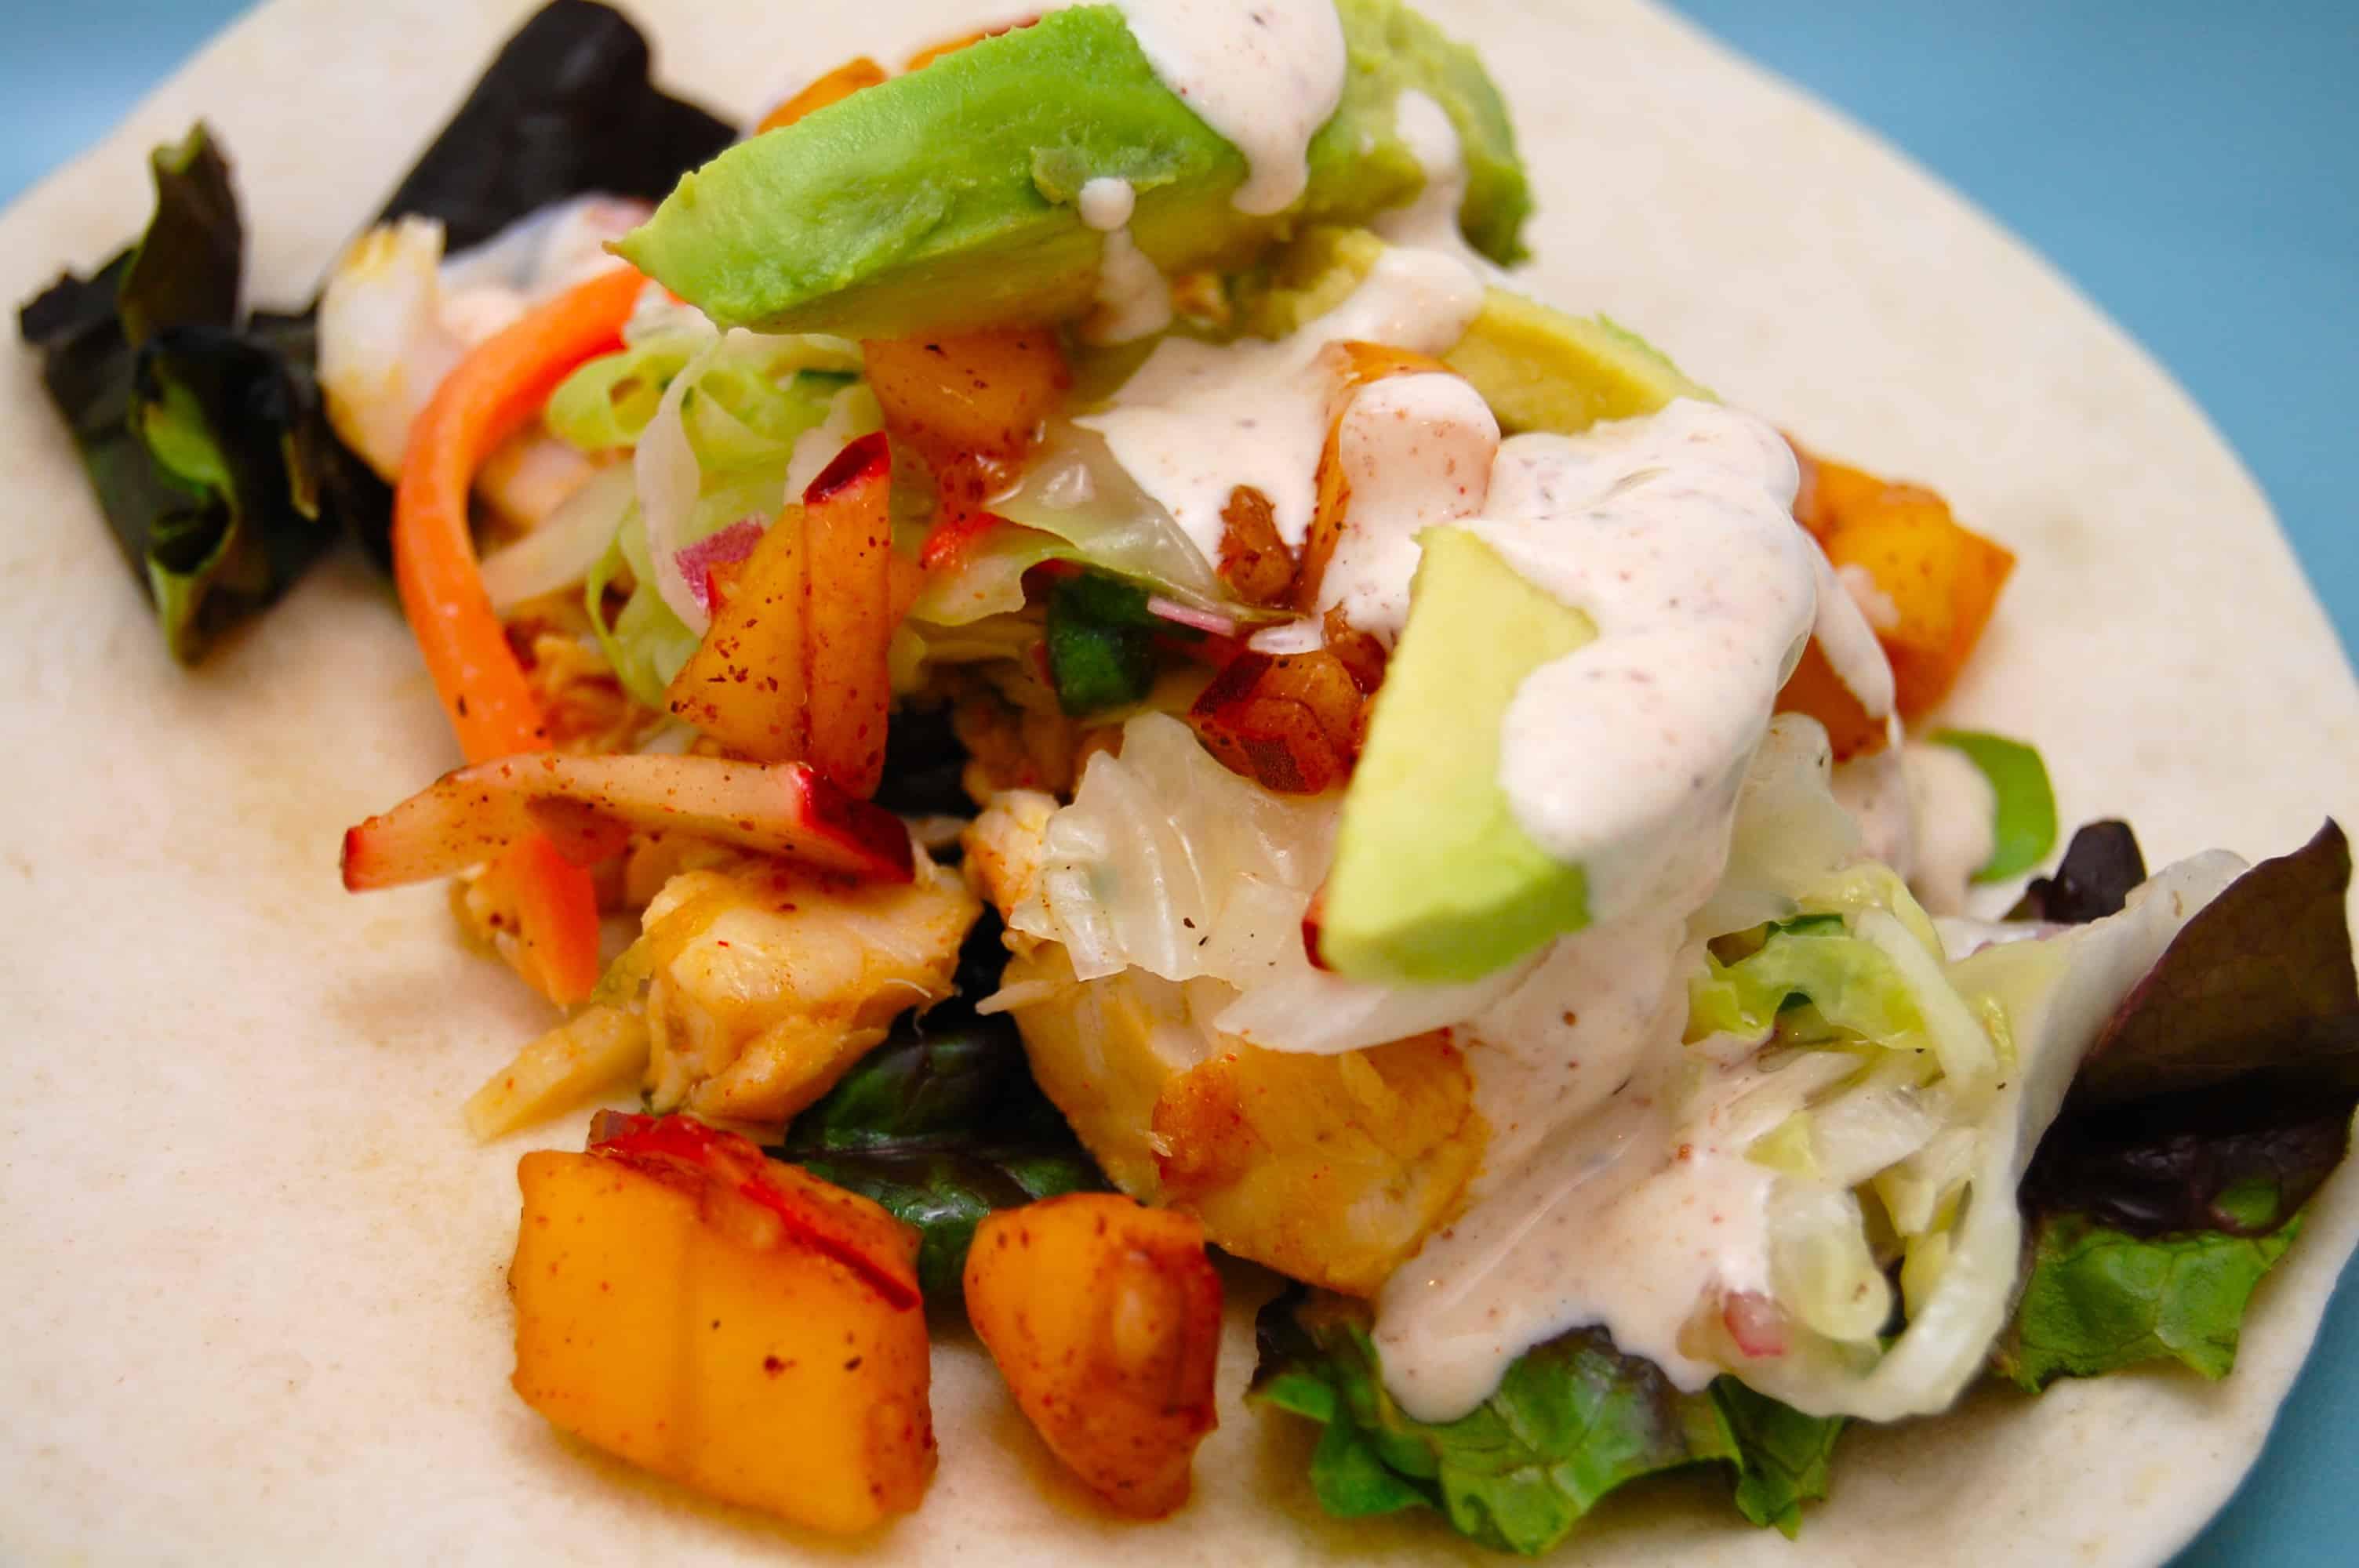 Baja fish tacos for Baja fish taco recipe